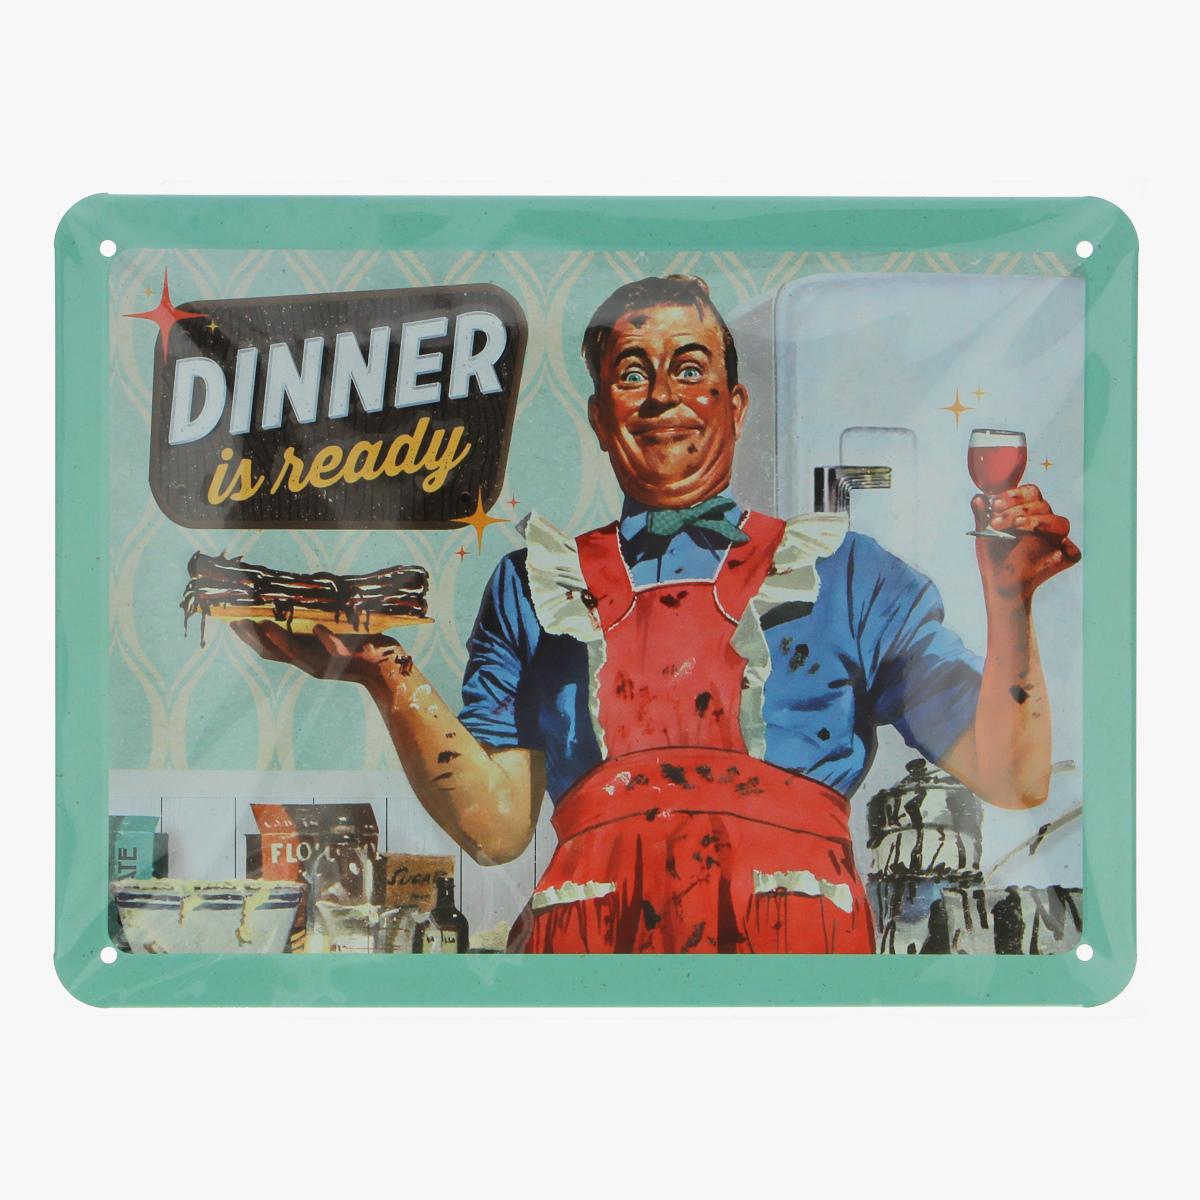 Afbeeldingen van blikken bordje dinner is ready repro